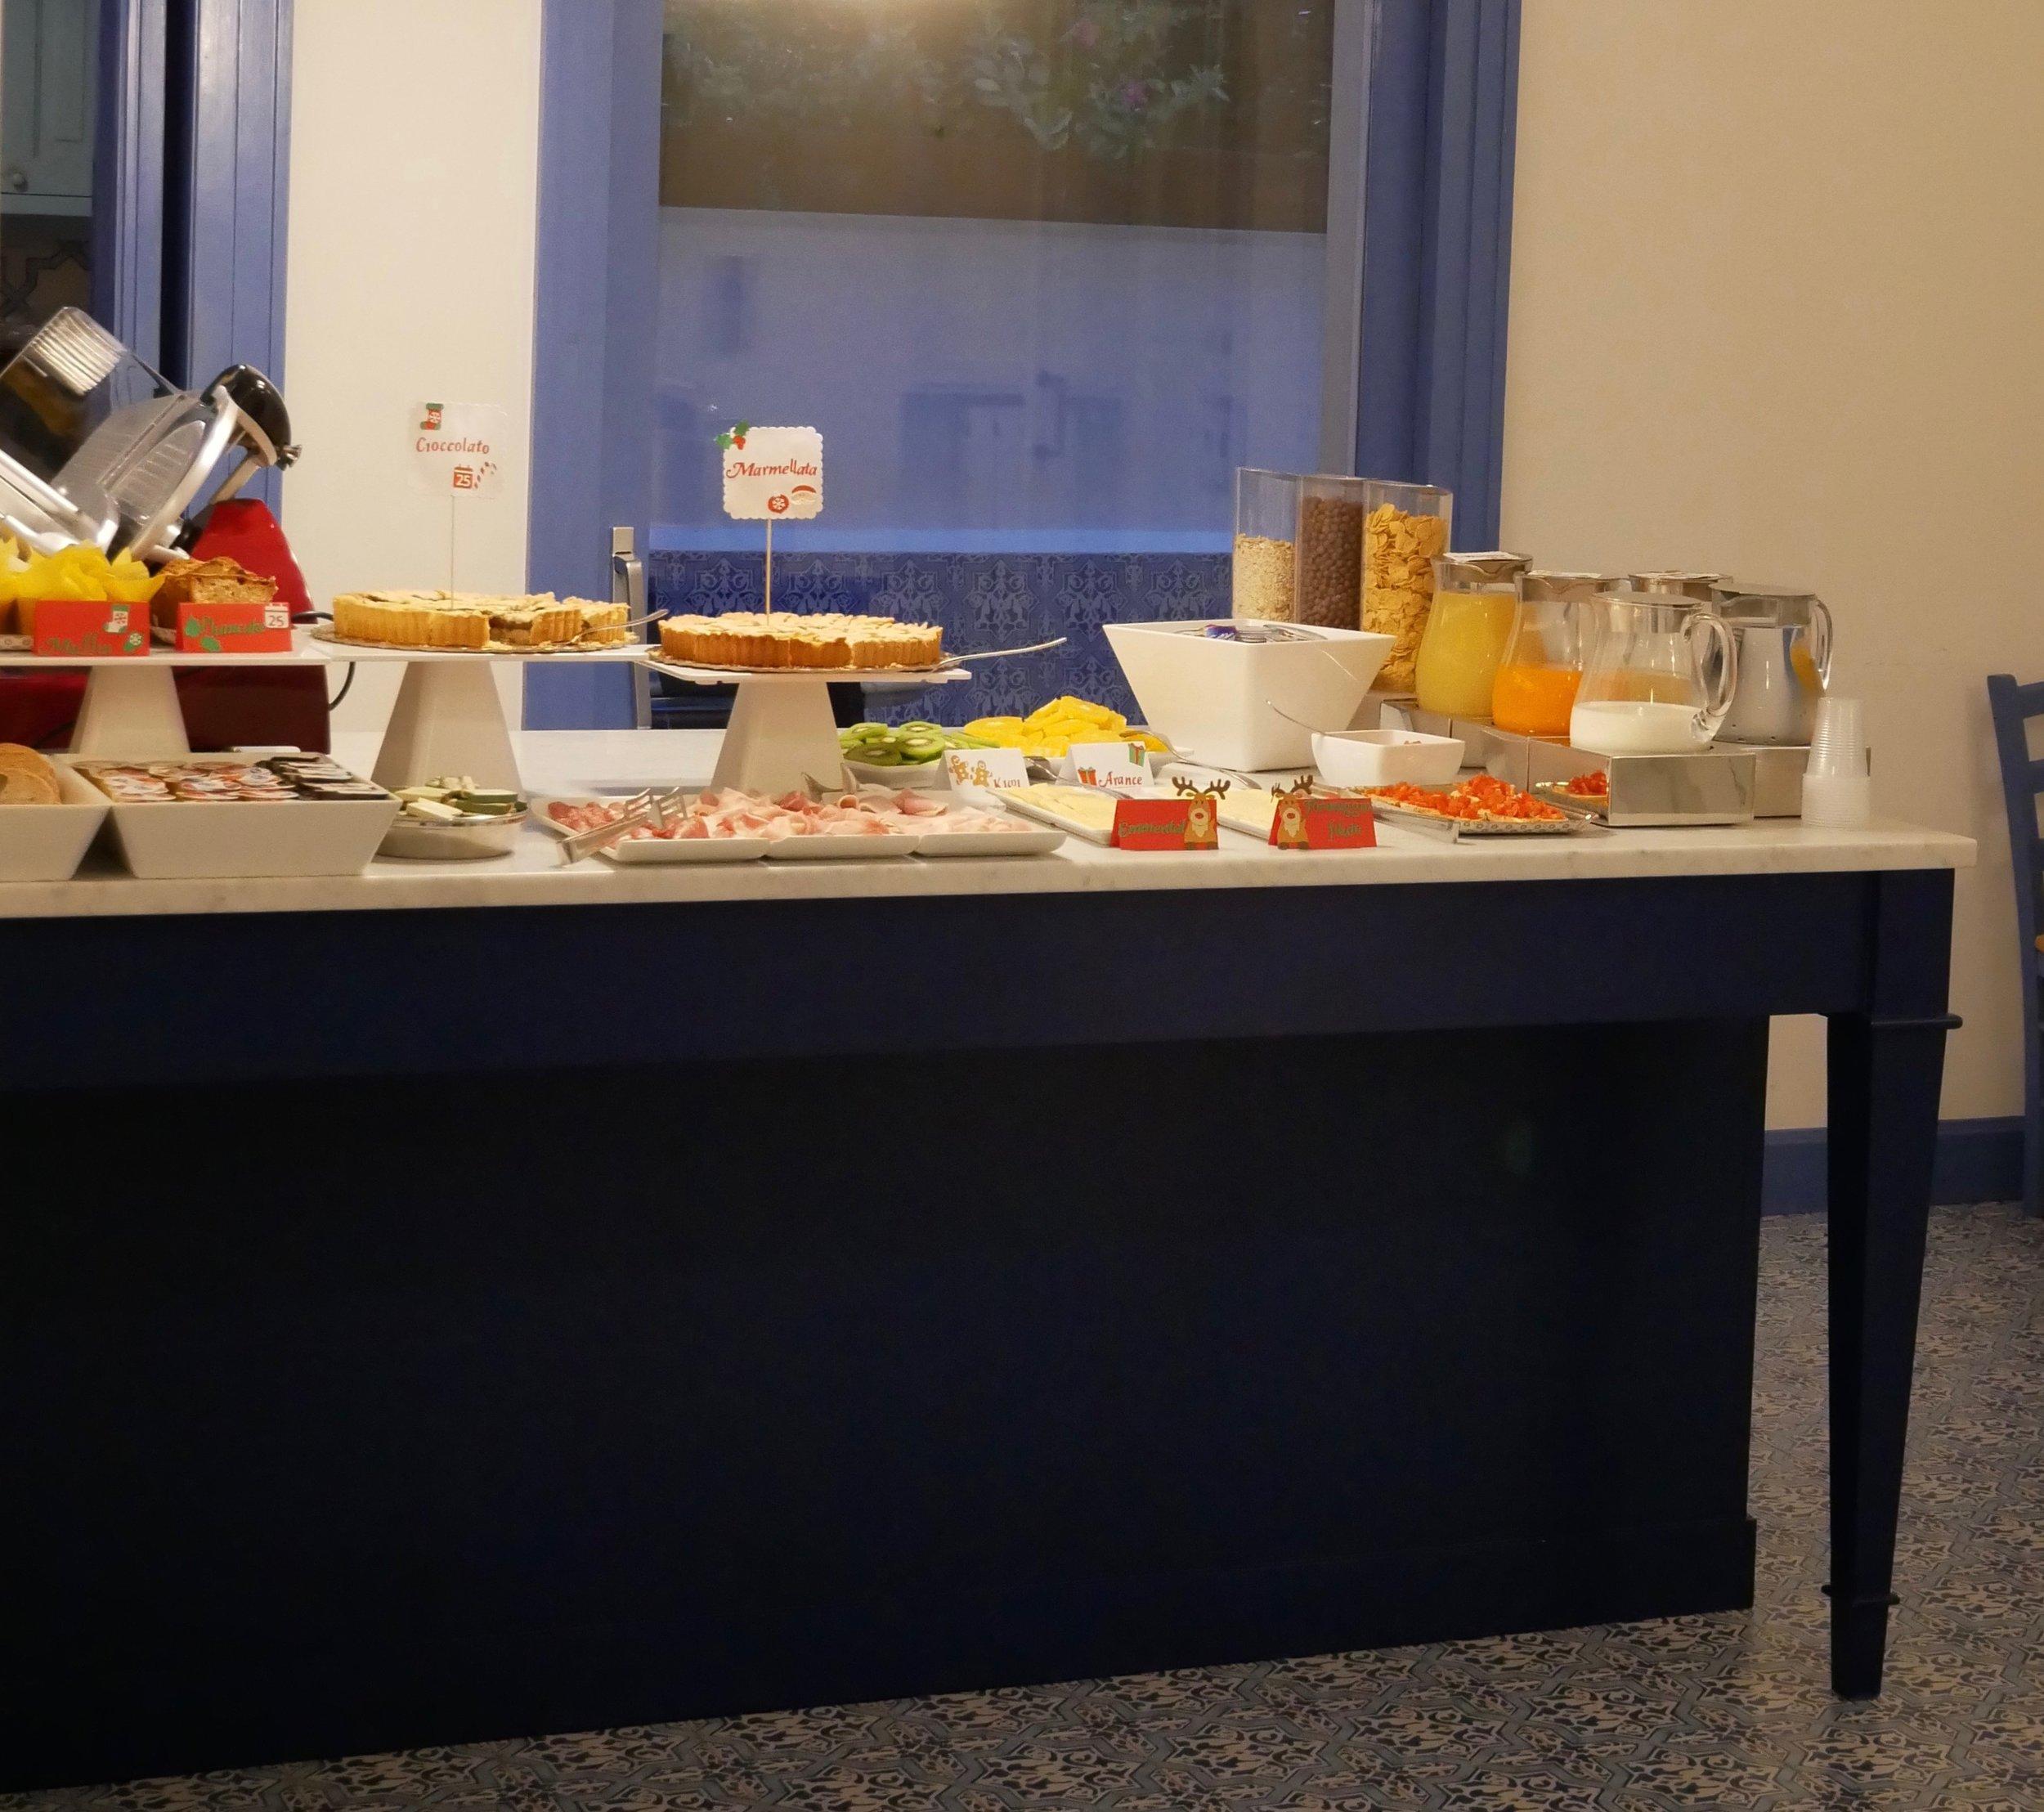 Hotel Mignon Sorrento breakfast buffet.jpg